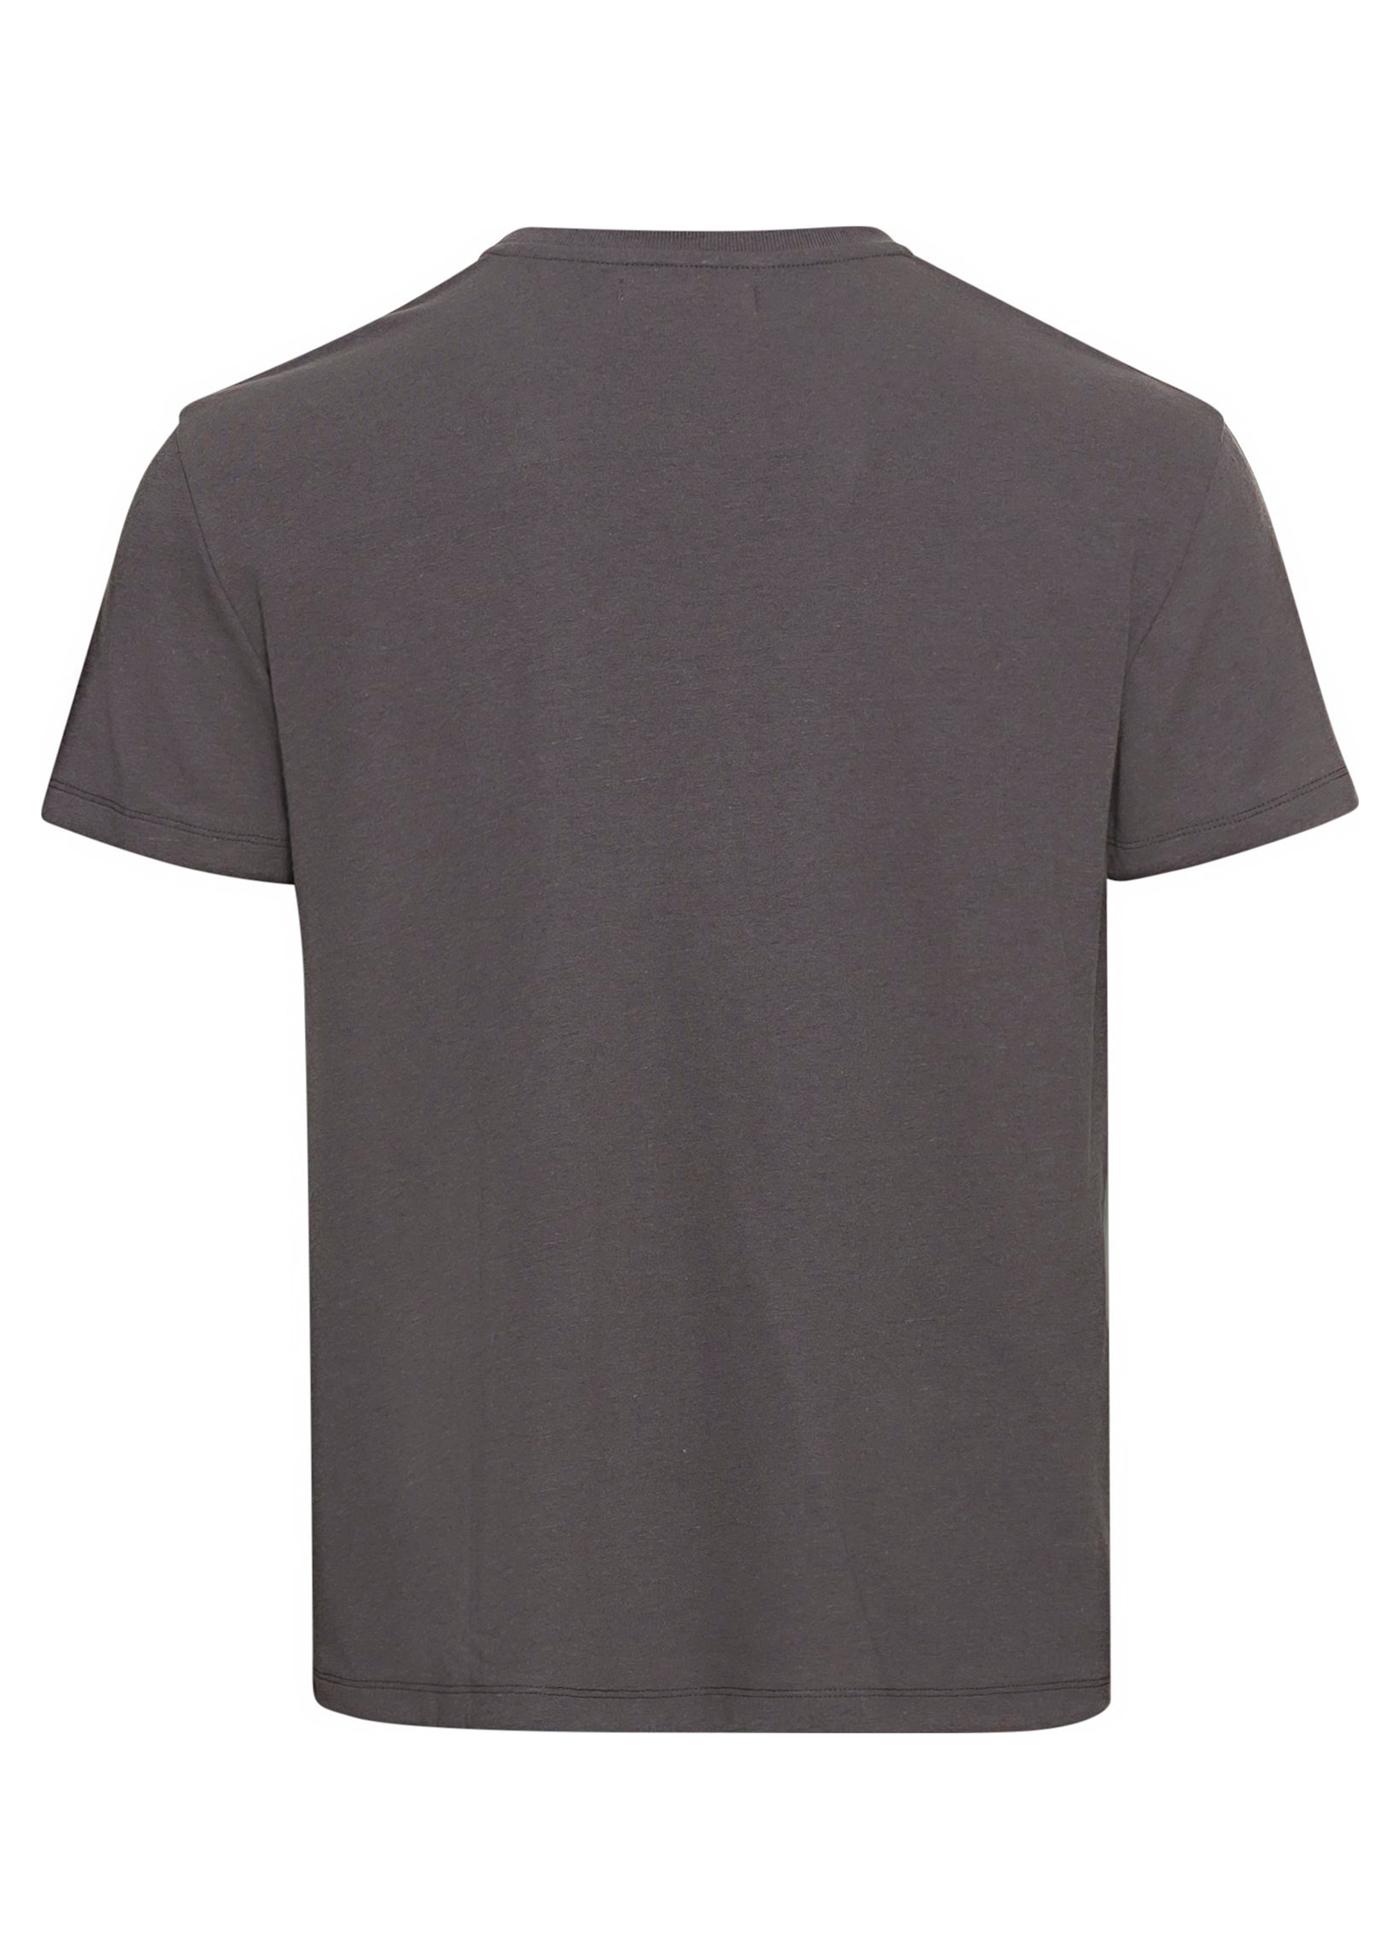 CREW T-Shirt image number 1